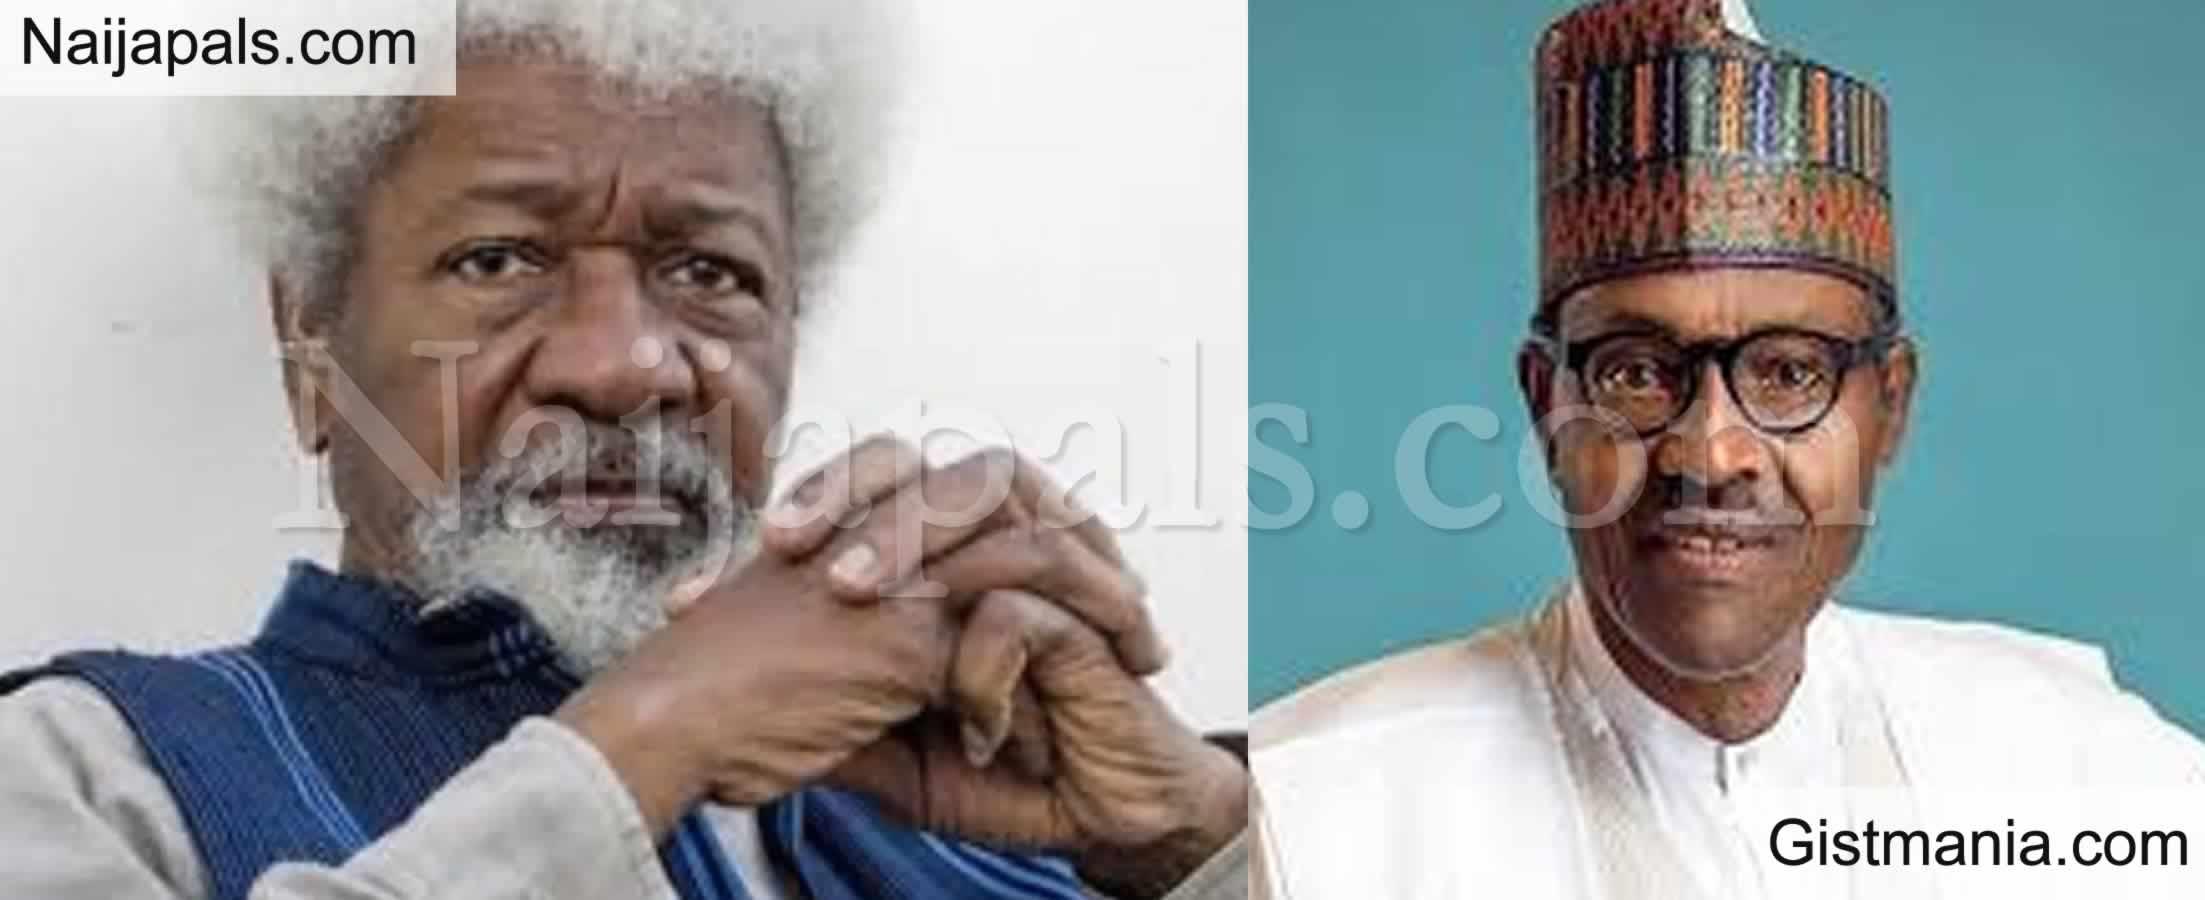 "<img alt='.' class='lazyload' data-src='https://img.gistmania.com/emot/news.gif' /> <b>""Pre. Buhari-Led Administration Is Not Capable To Unite Nigeria"" -Prof. Wole Soyinka Blows Hot</b>"